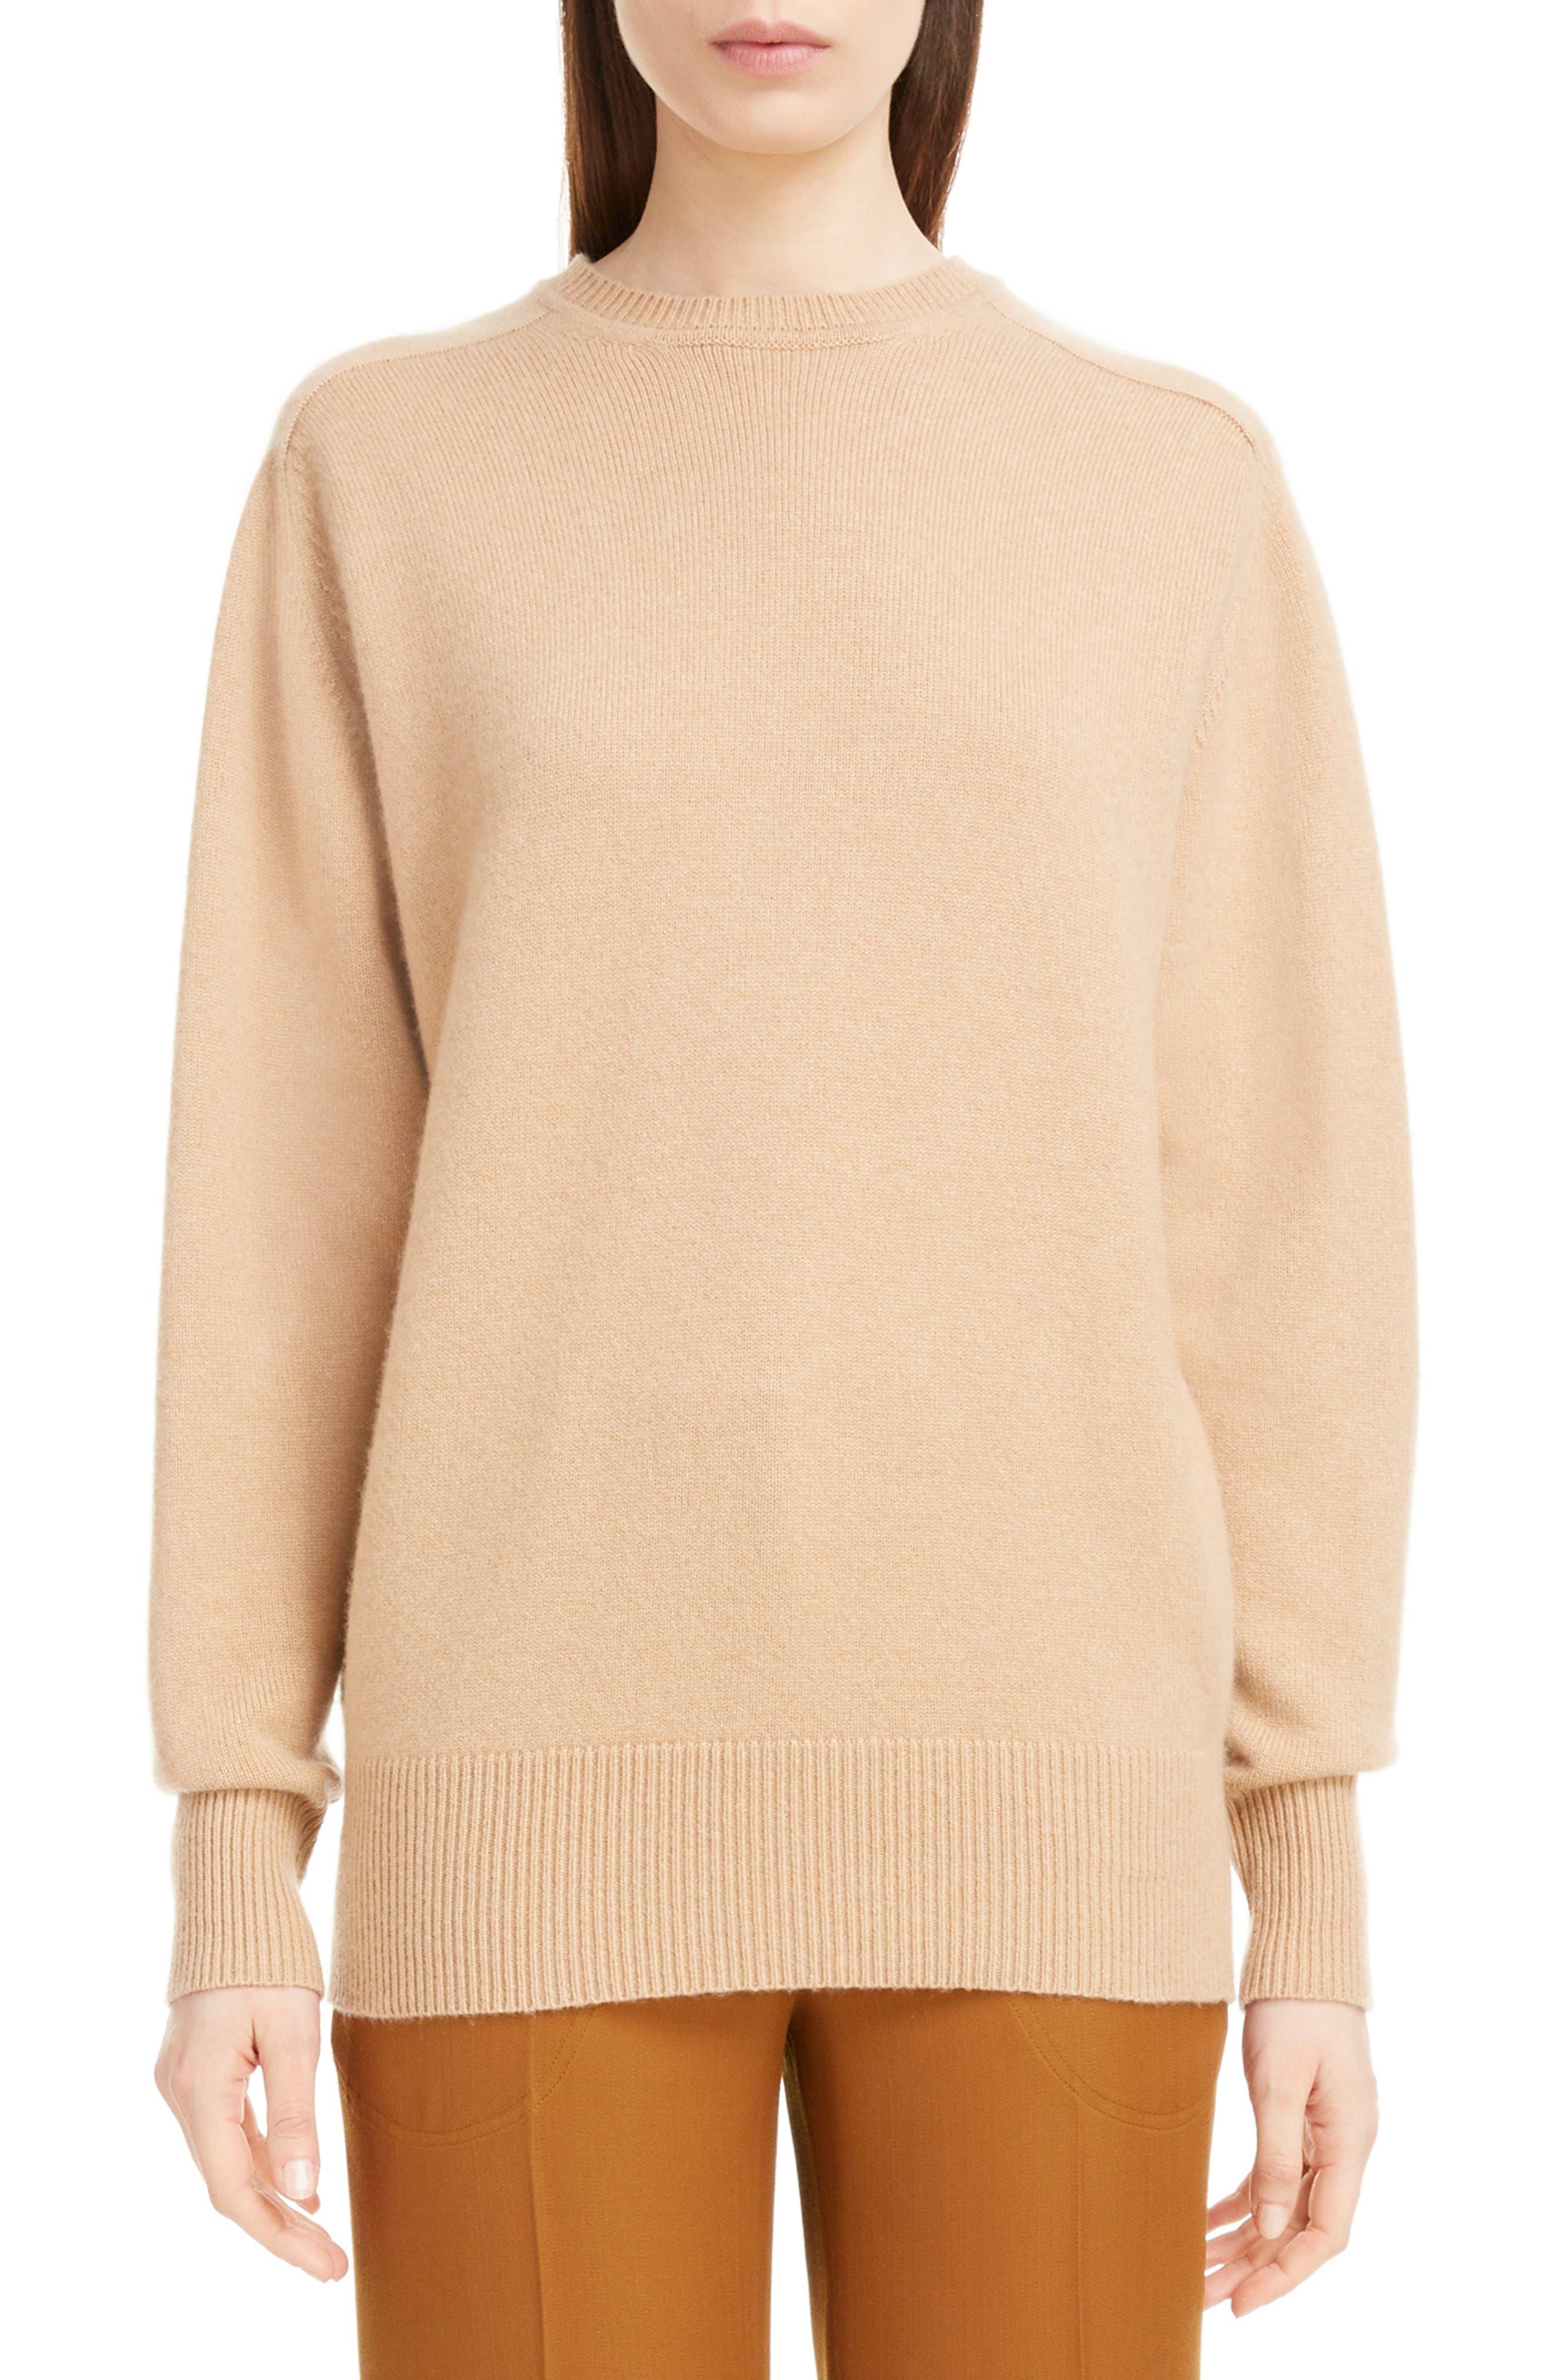 VICTORIA BECKHAM, Cashmere Blend Sweater, Main thumbnail 1, color, LIGHT CAMEL